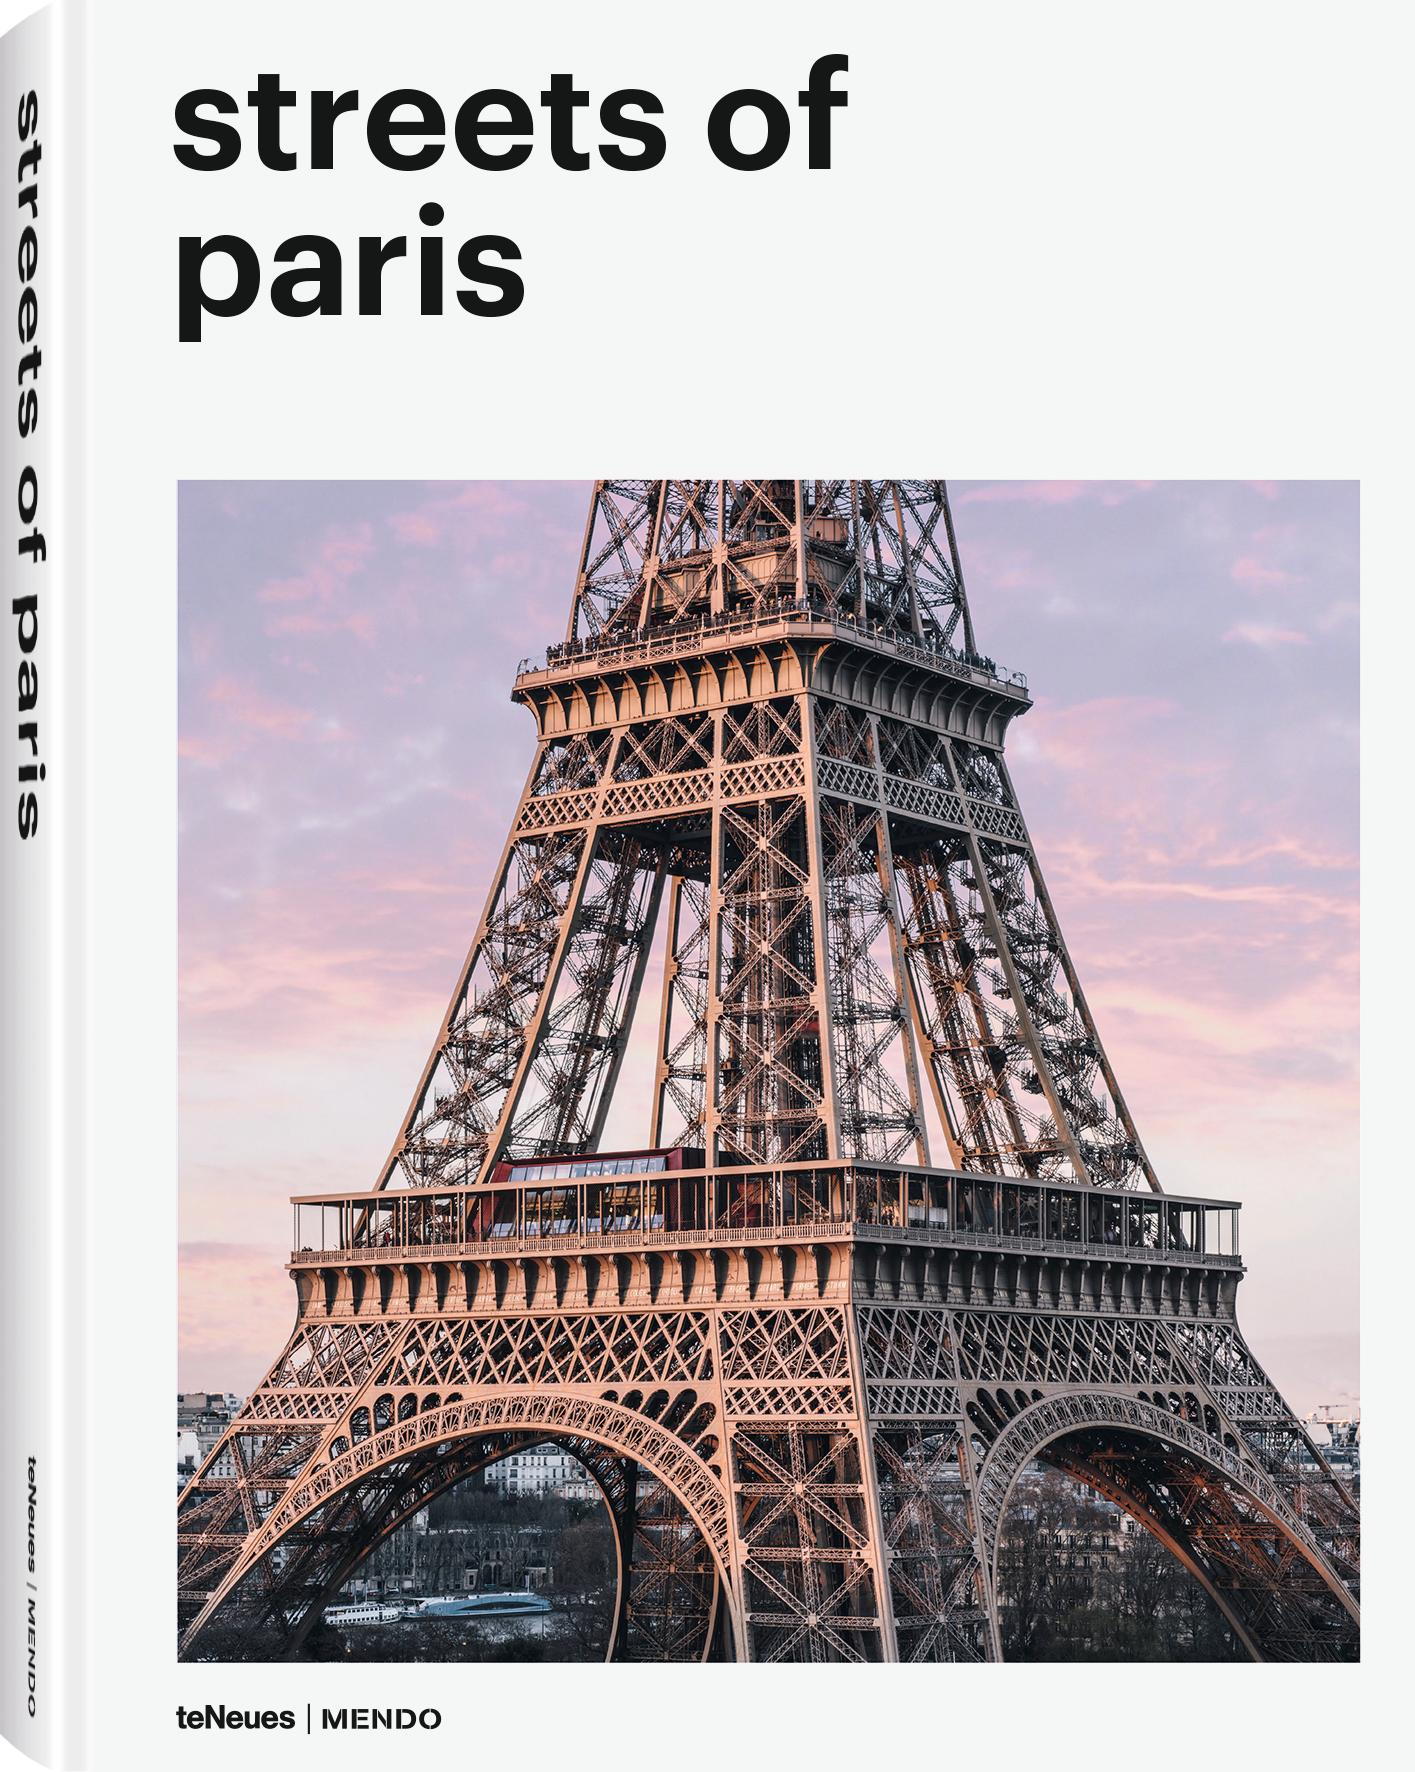 Bildband Streets of Paris, Papier, Hardcover, Mehrfarbig, 22 x 29 cm